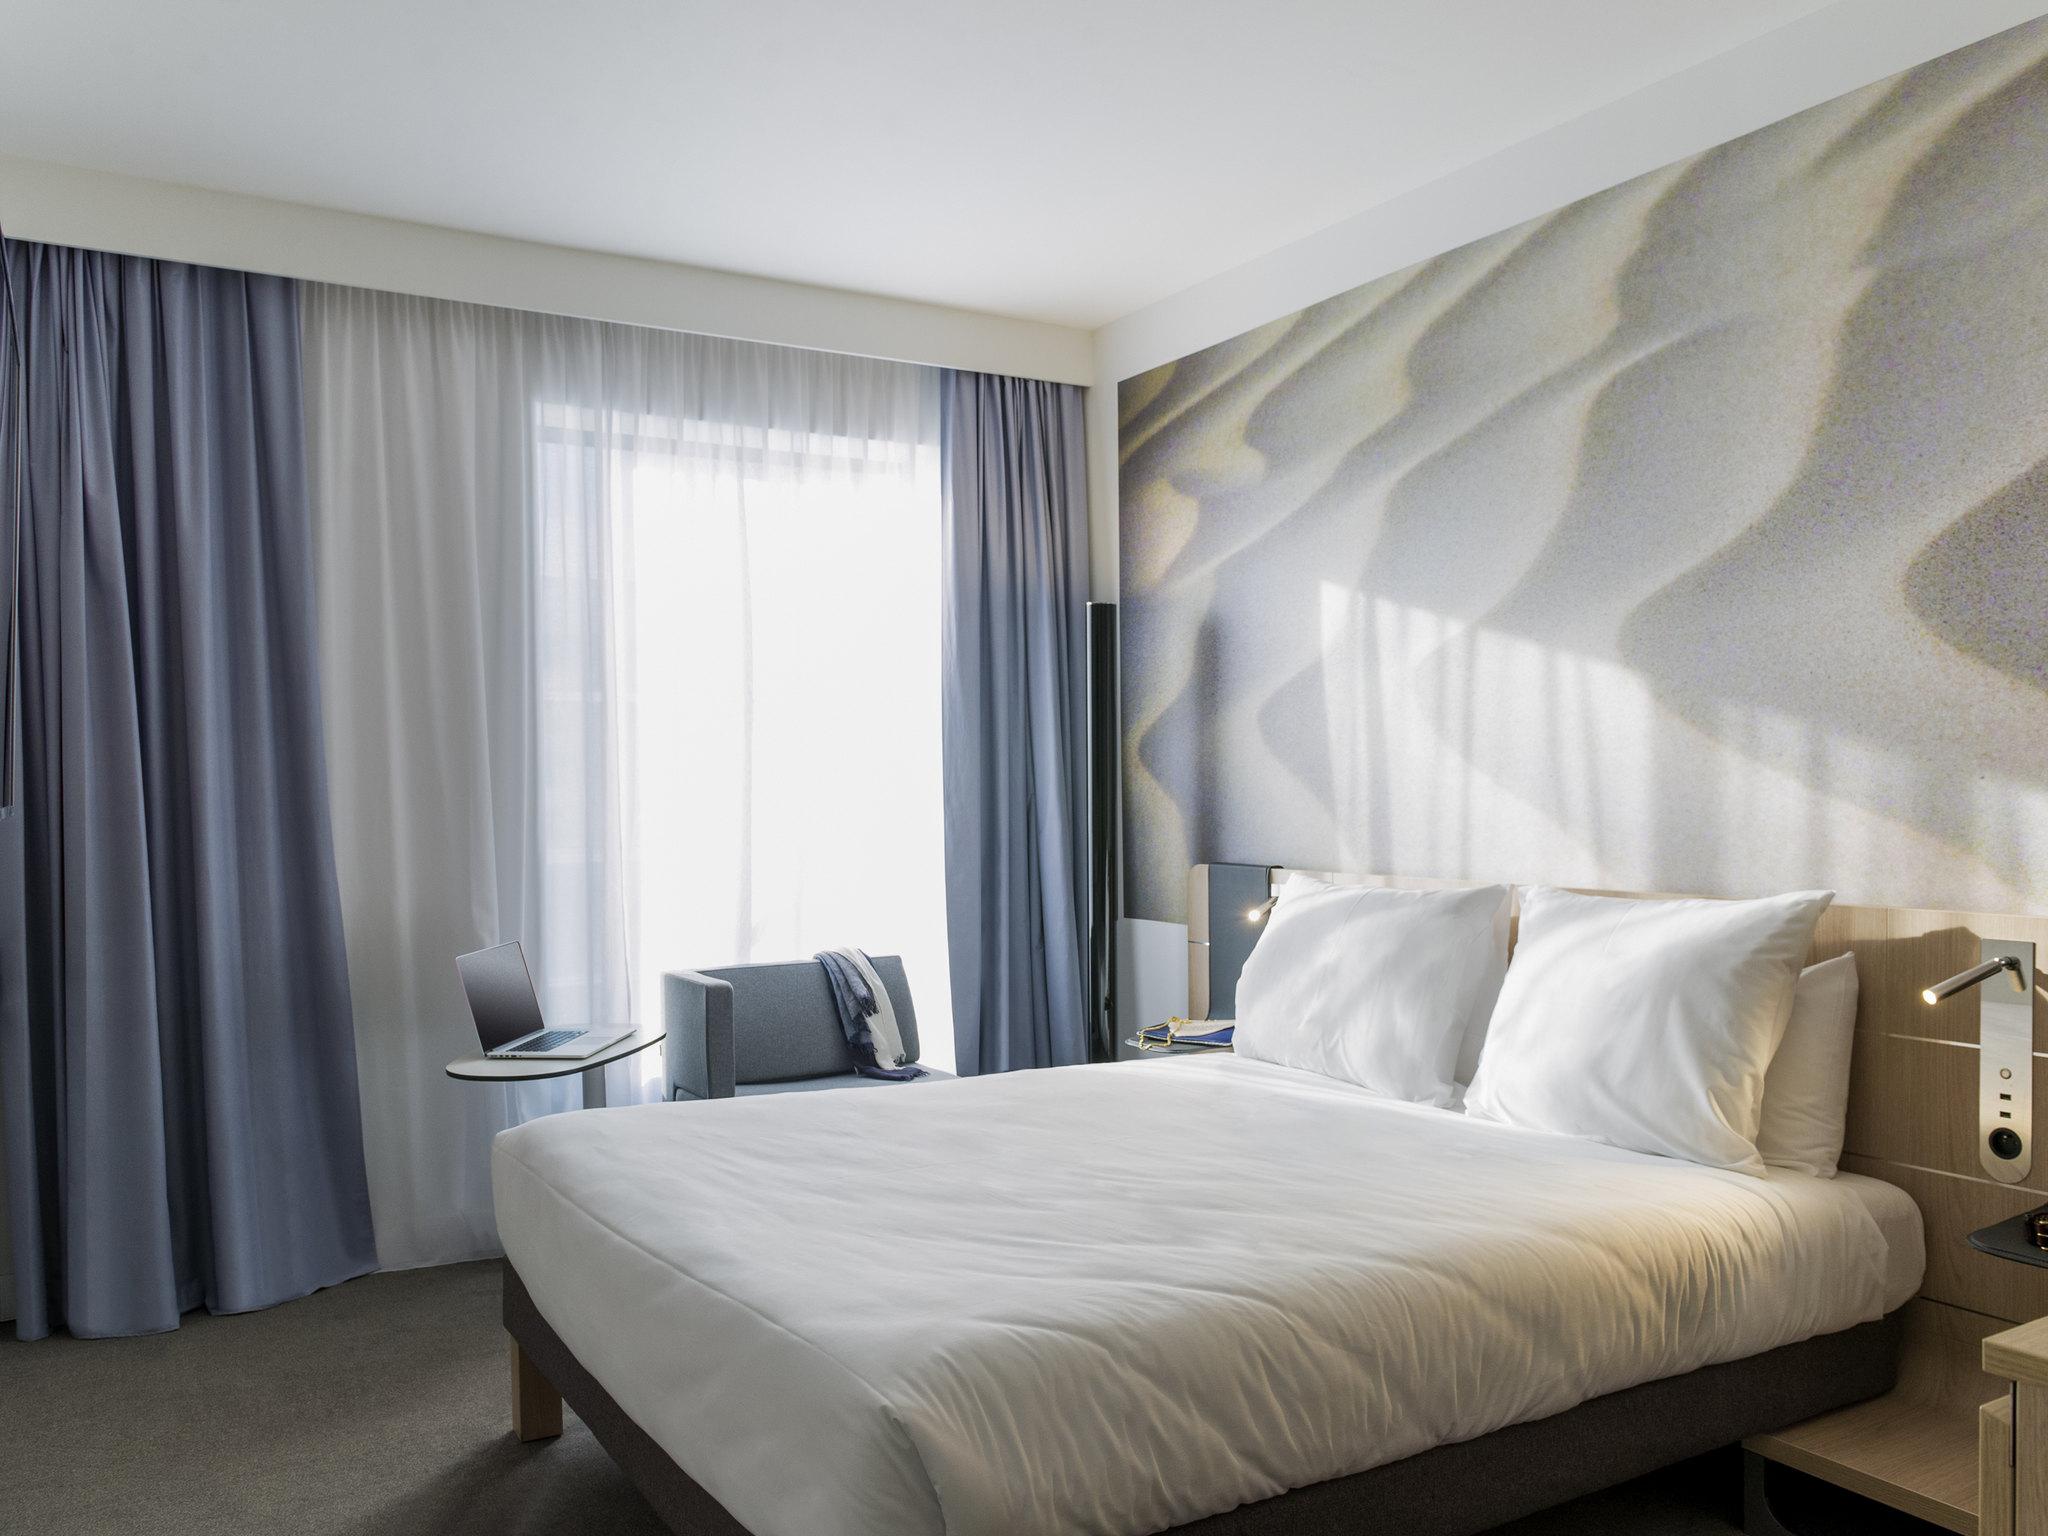 Hotell – Novotel Charleroi Centre